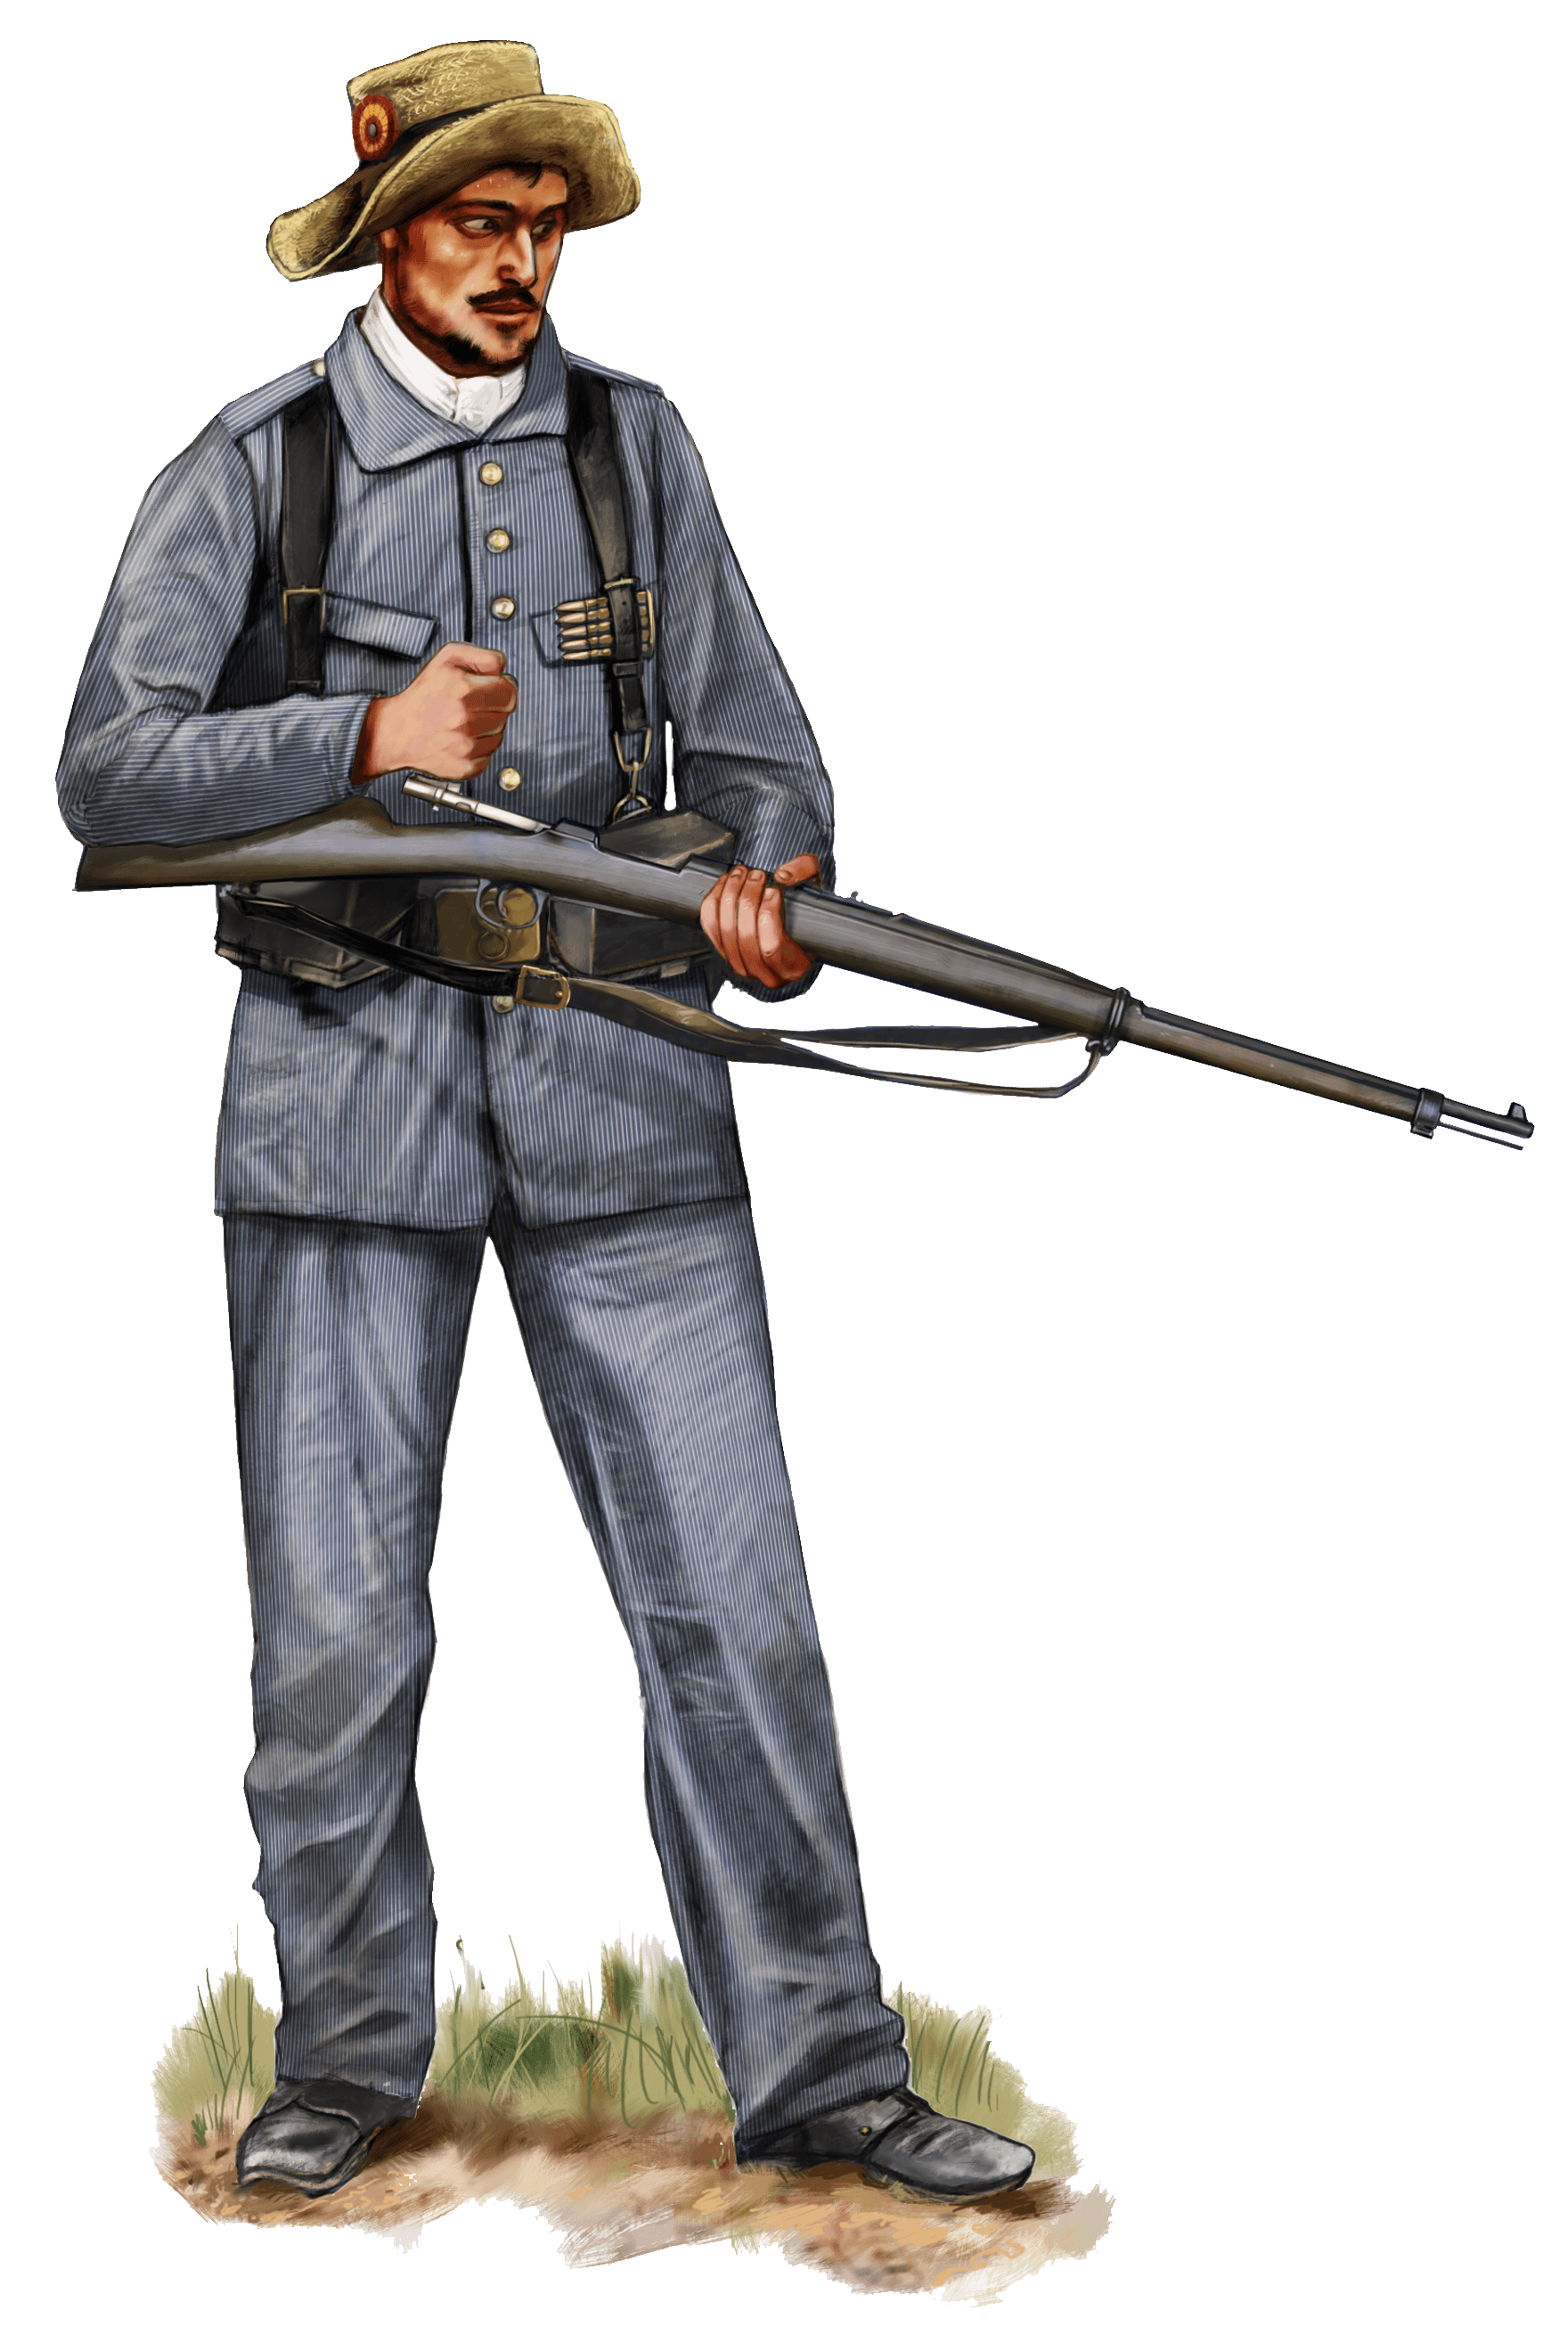 Rayadillo uniforme uniform